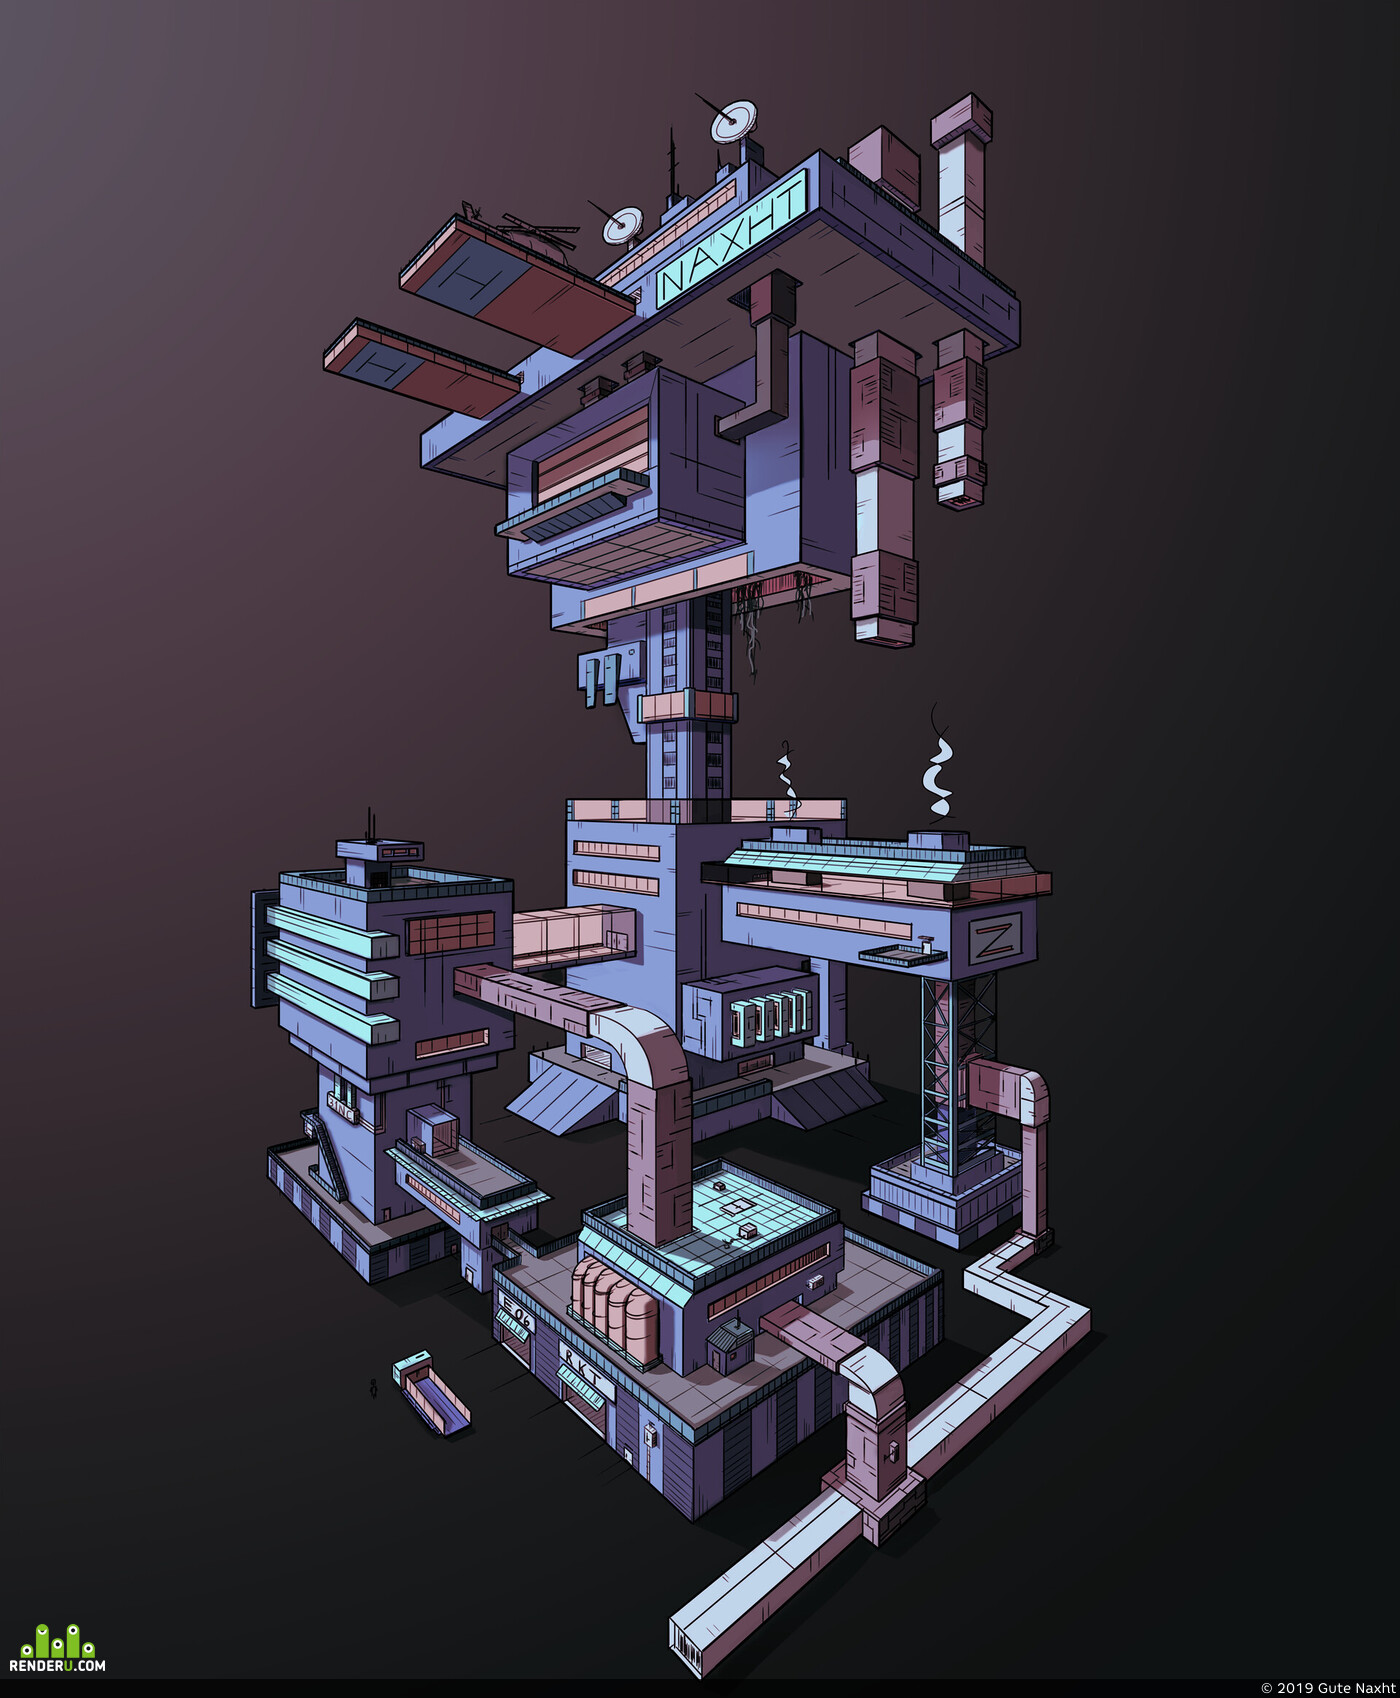 Концепт-арт, архитектура, здание, завод, дизайн